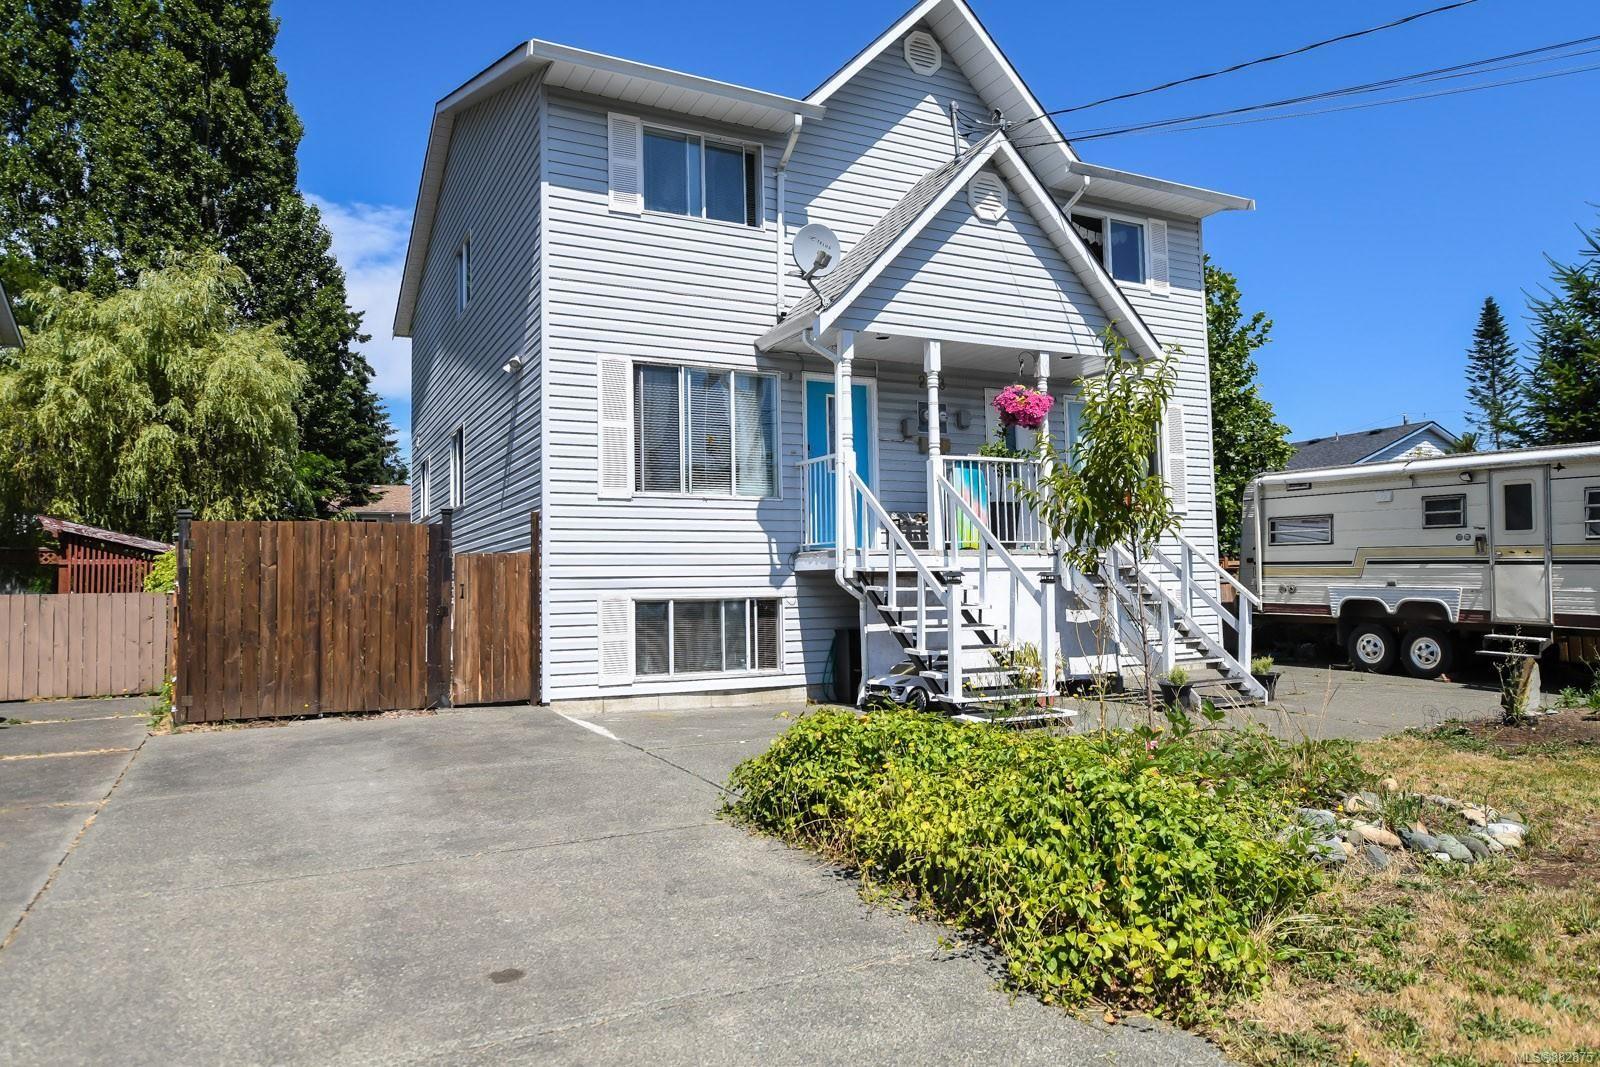 Main Photo: B 223 Mitchell Pl in Courtenay: CV Courtenay City Half Duplex for sale (Comox Valley)  : MLS®# 882875